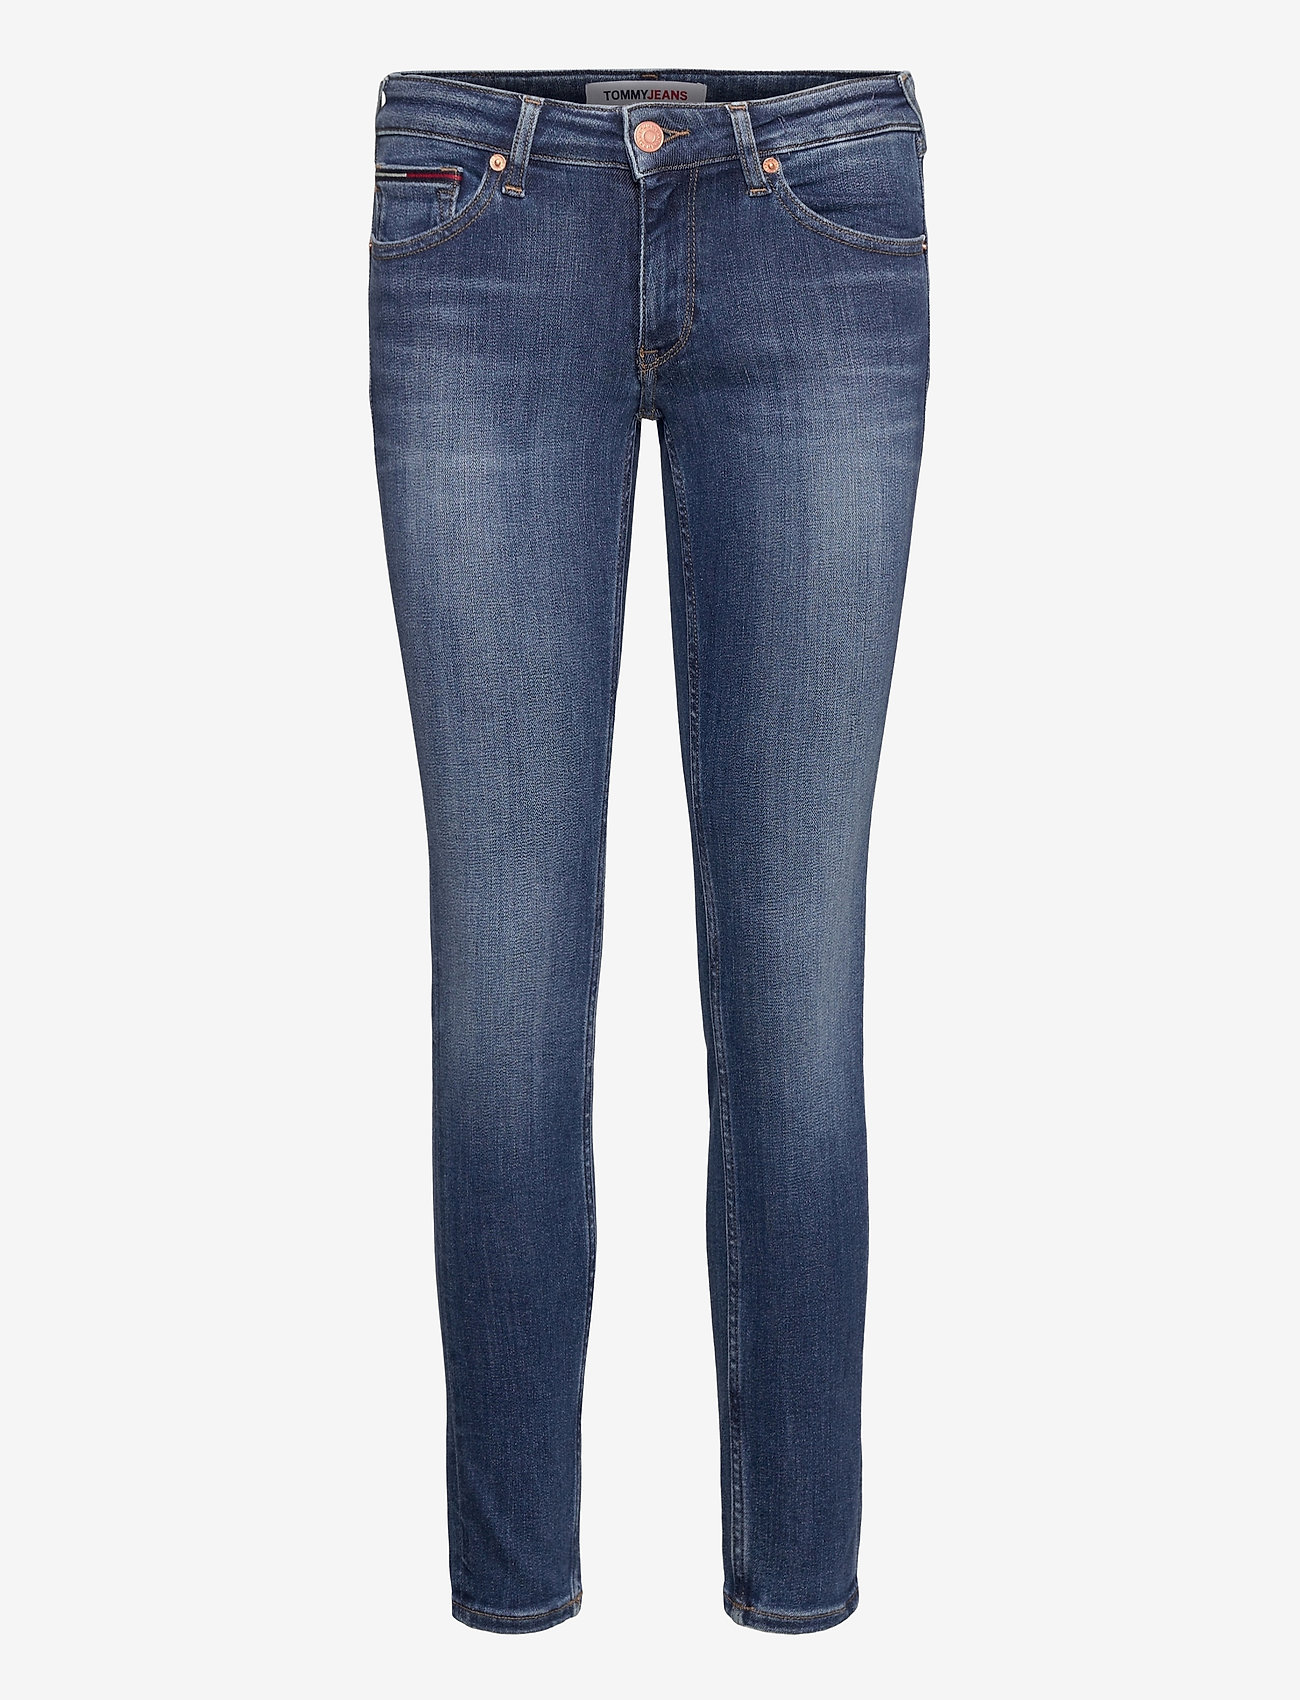 Tommy Jeans - SOPHIE LR SKNY HLDBST - skinny jeans - harlow dark blue str - 0